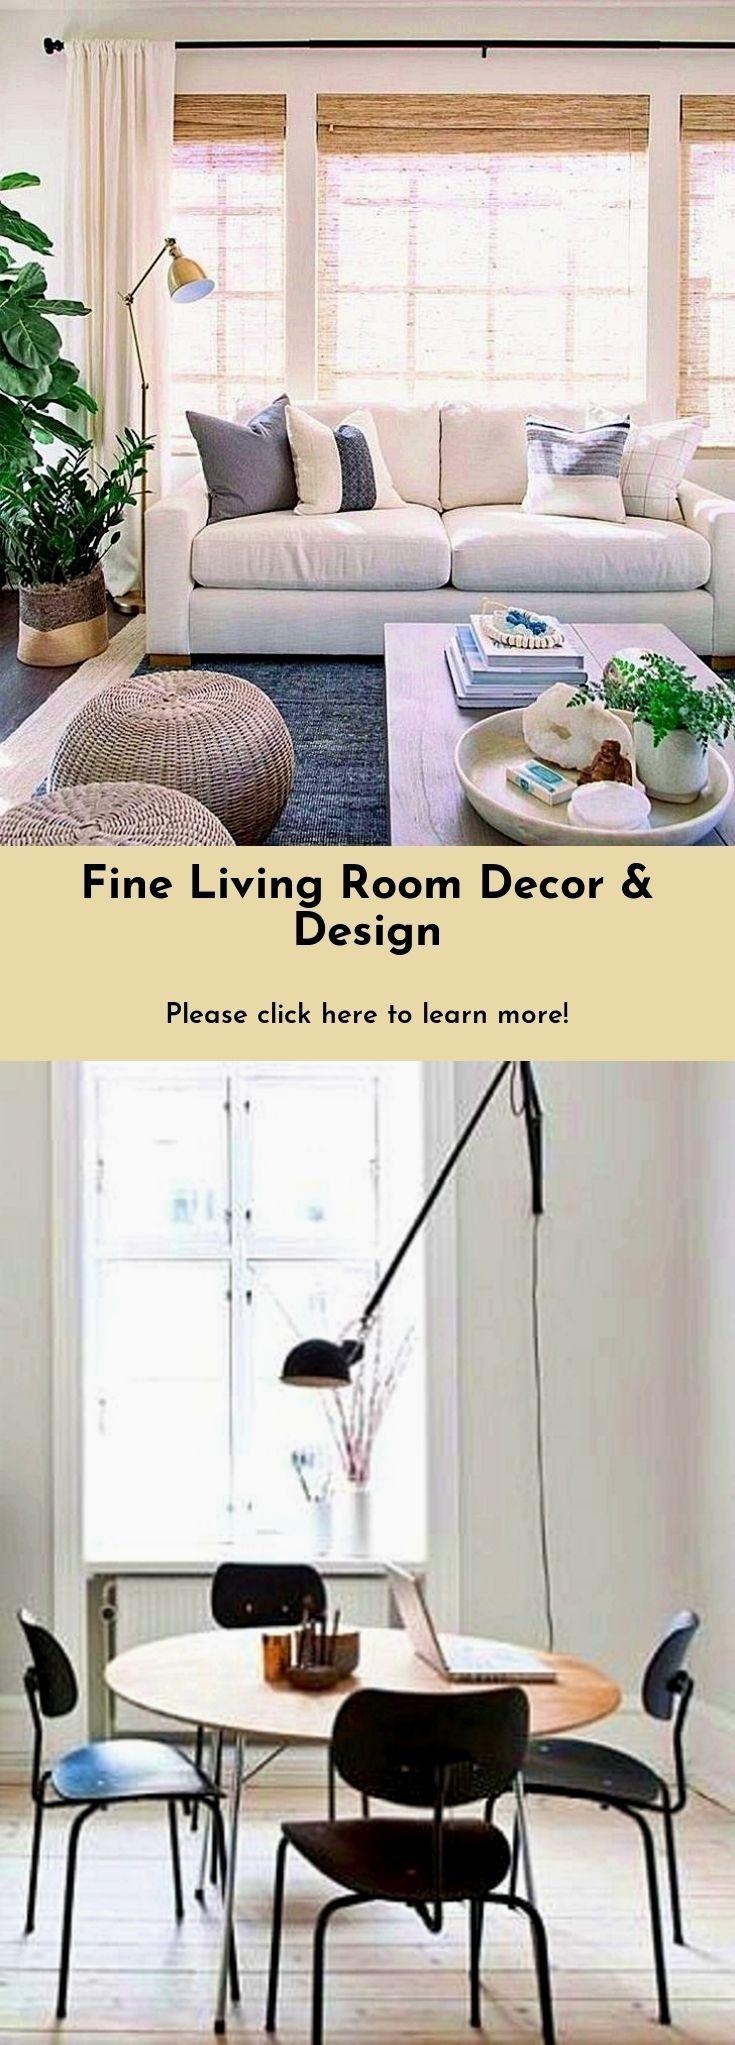 Pretty Living Room Styles Checklist Living Room Reveal Living Room Design Modern Living Room Style Inspiration